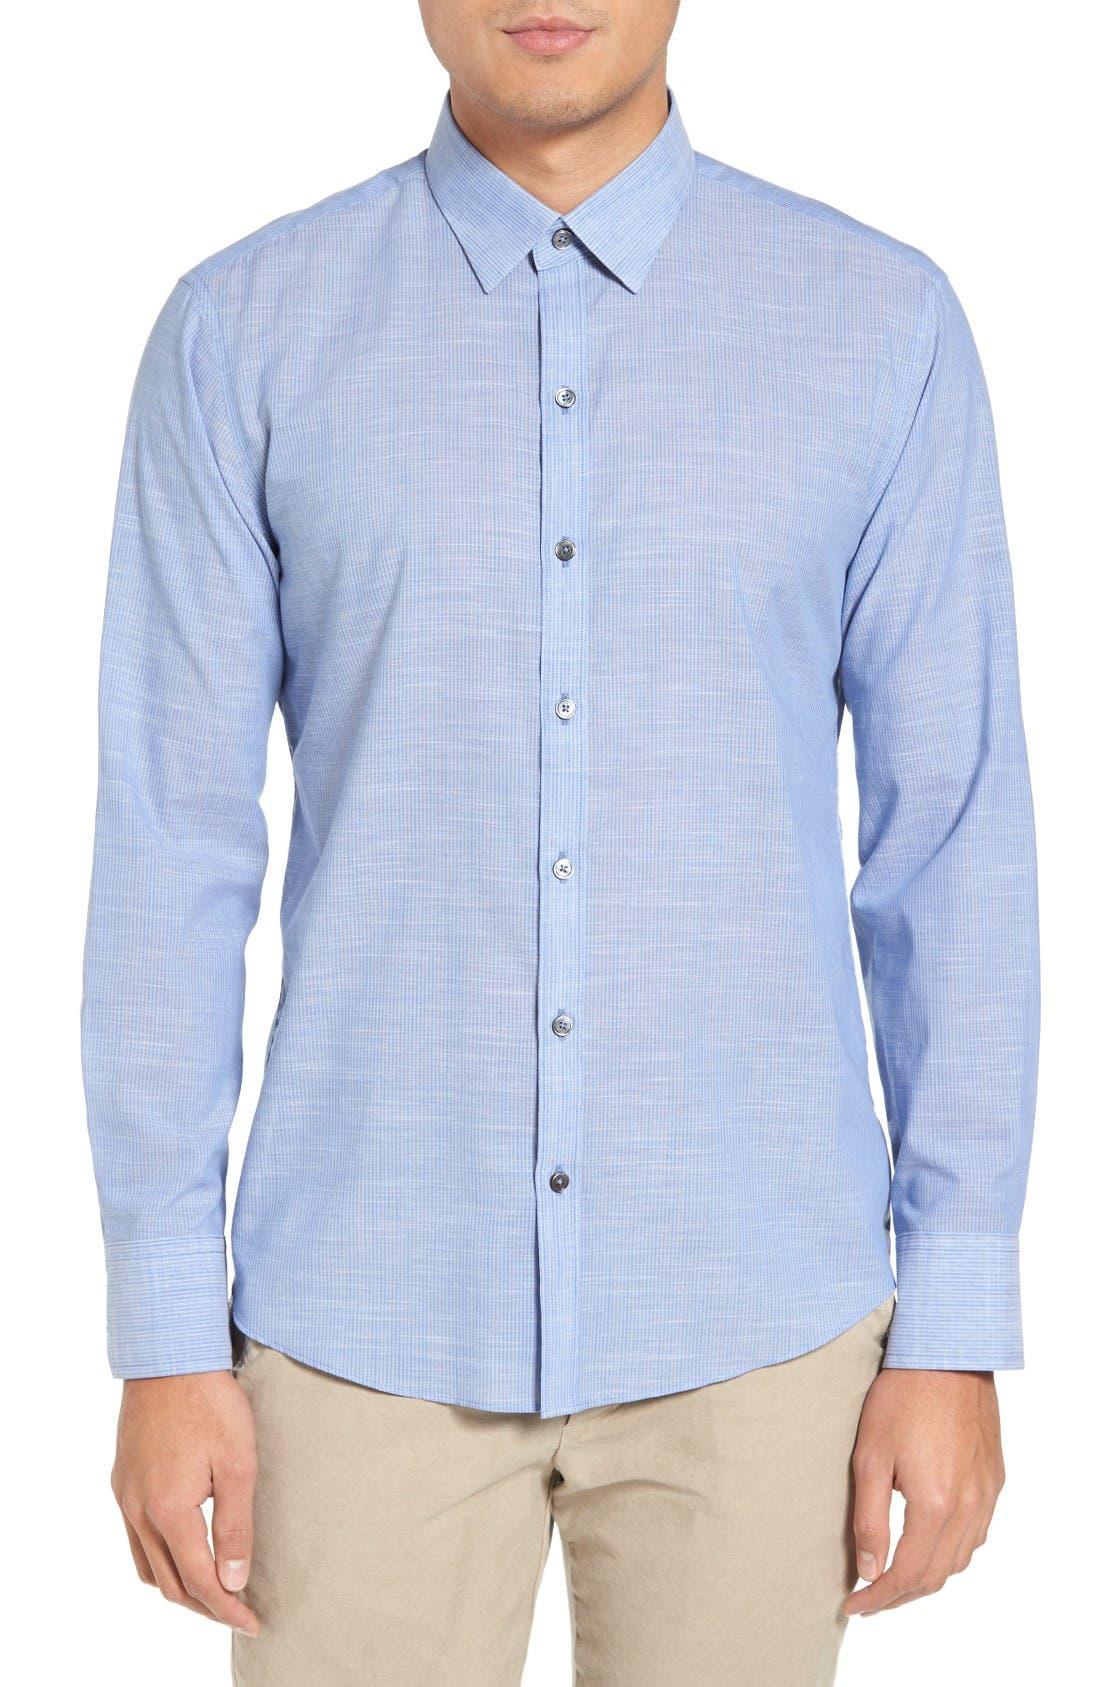 Main Image - Zachary Prell Ronan Trim Fit Stripe Sport Shirt